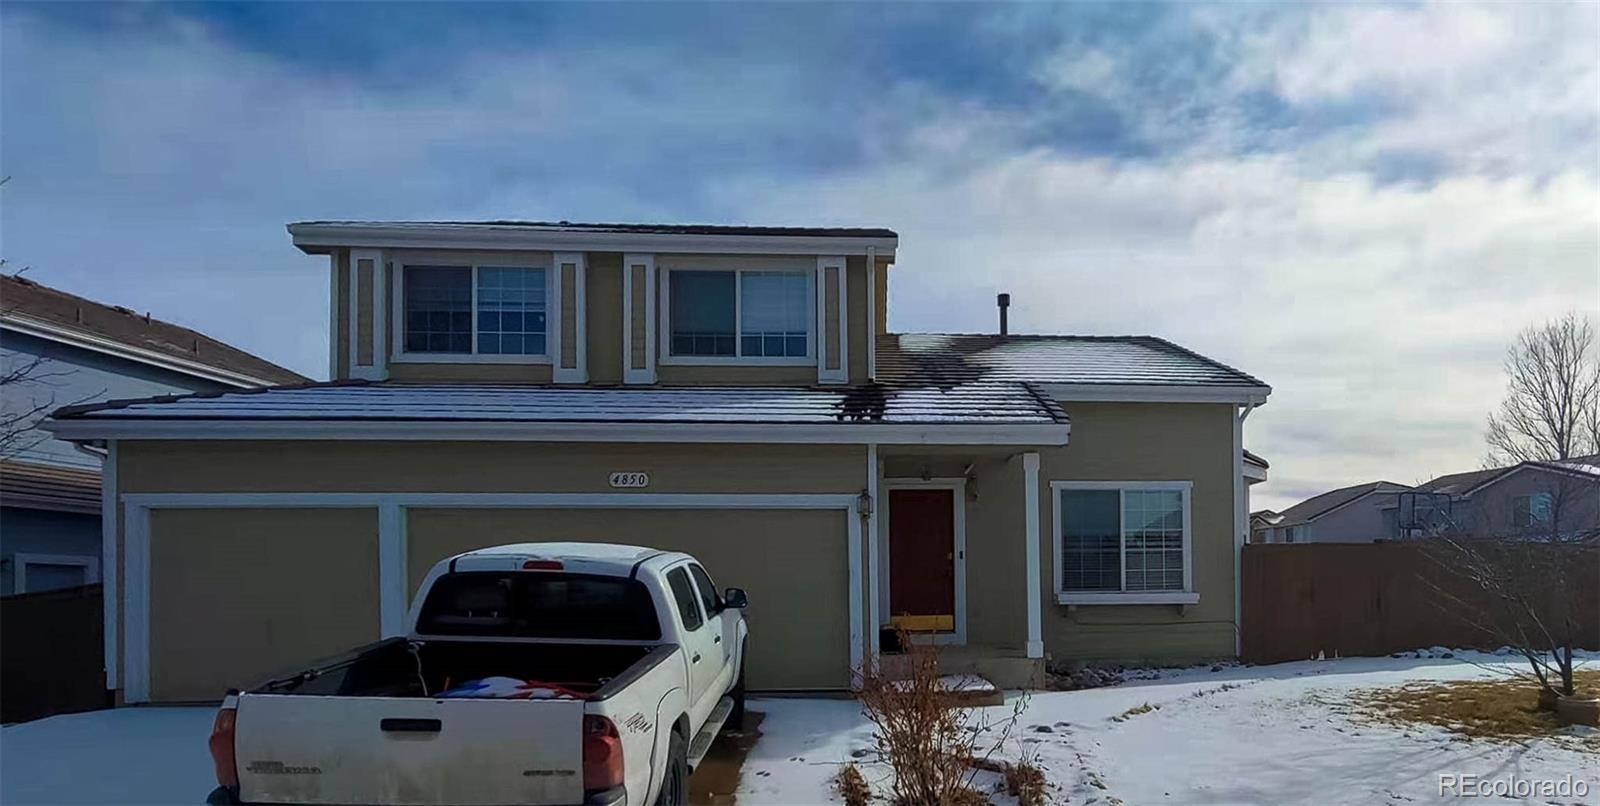 MLS# 9984955 - 1 - 4850 Ashbrook Circle, Highlands Ranch, CO 80130